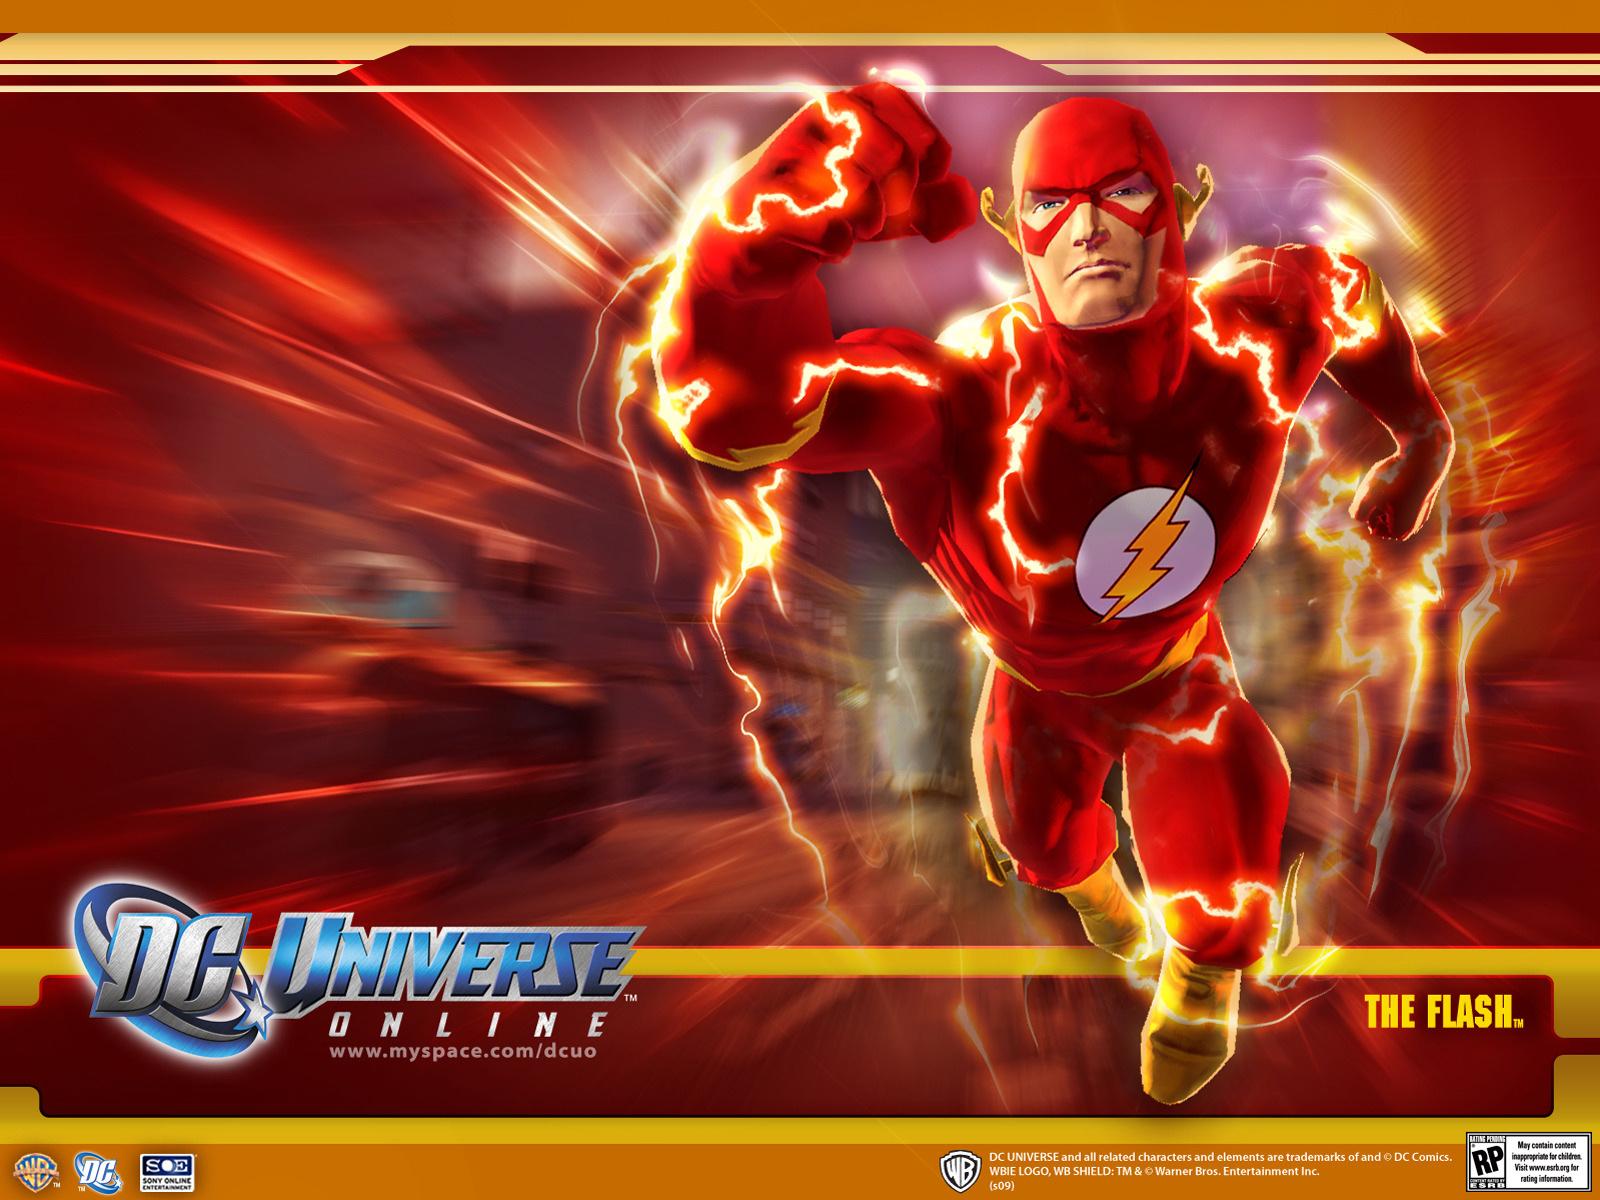 Flash   Superhero Games Wallpaper Image featuring Dc Universe Online 1600x1200